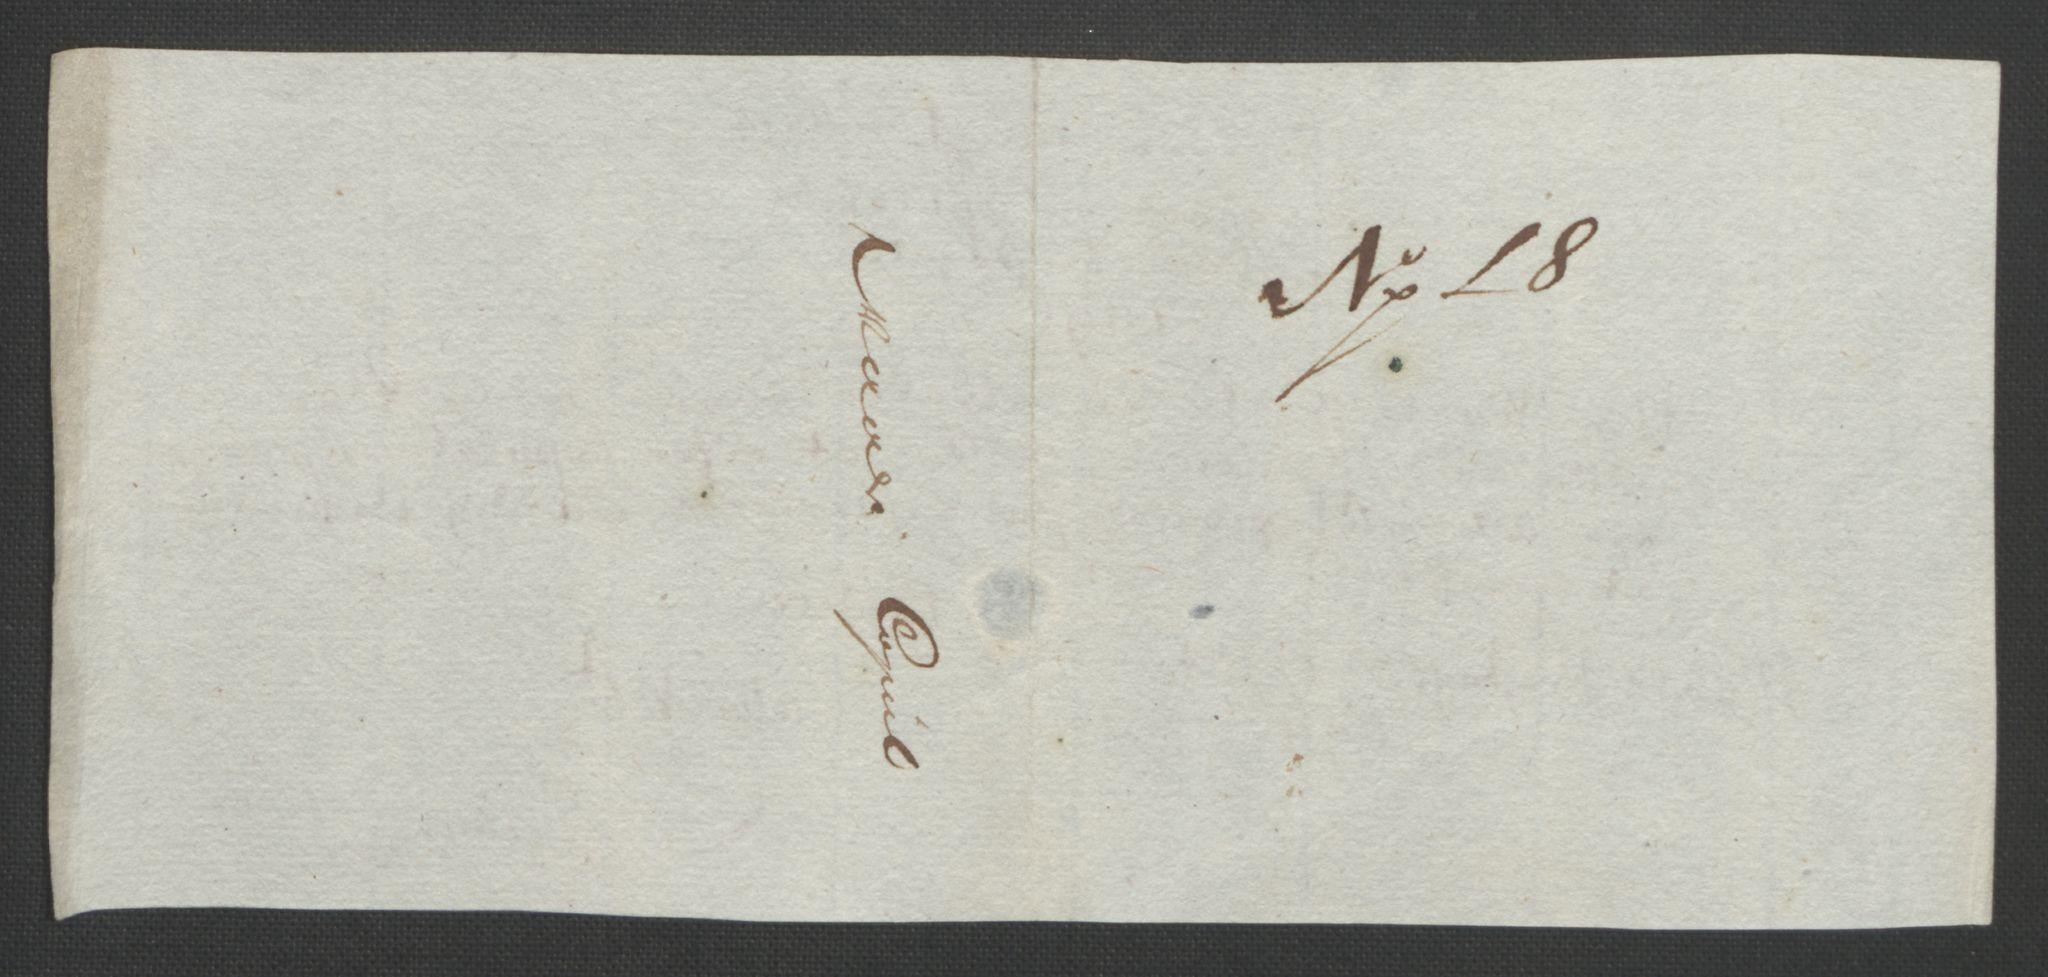 RA, Rentekammeret inntil 1814, Reviderte regnskaper, Fogderegnskap, R32/L1864: Fogderegnskap Jarlsberg grevskap, 1691, s. 156